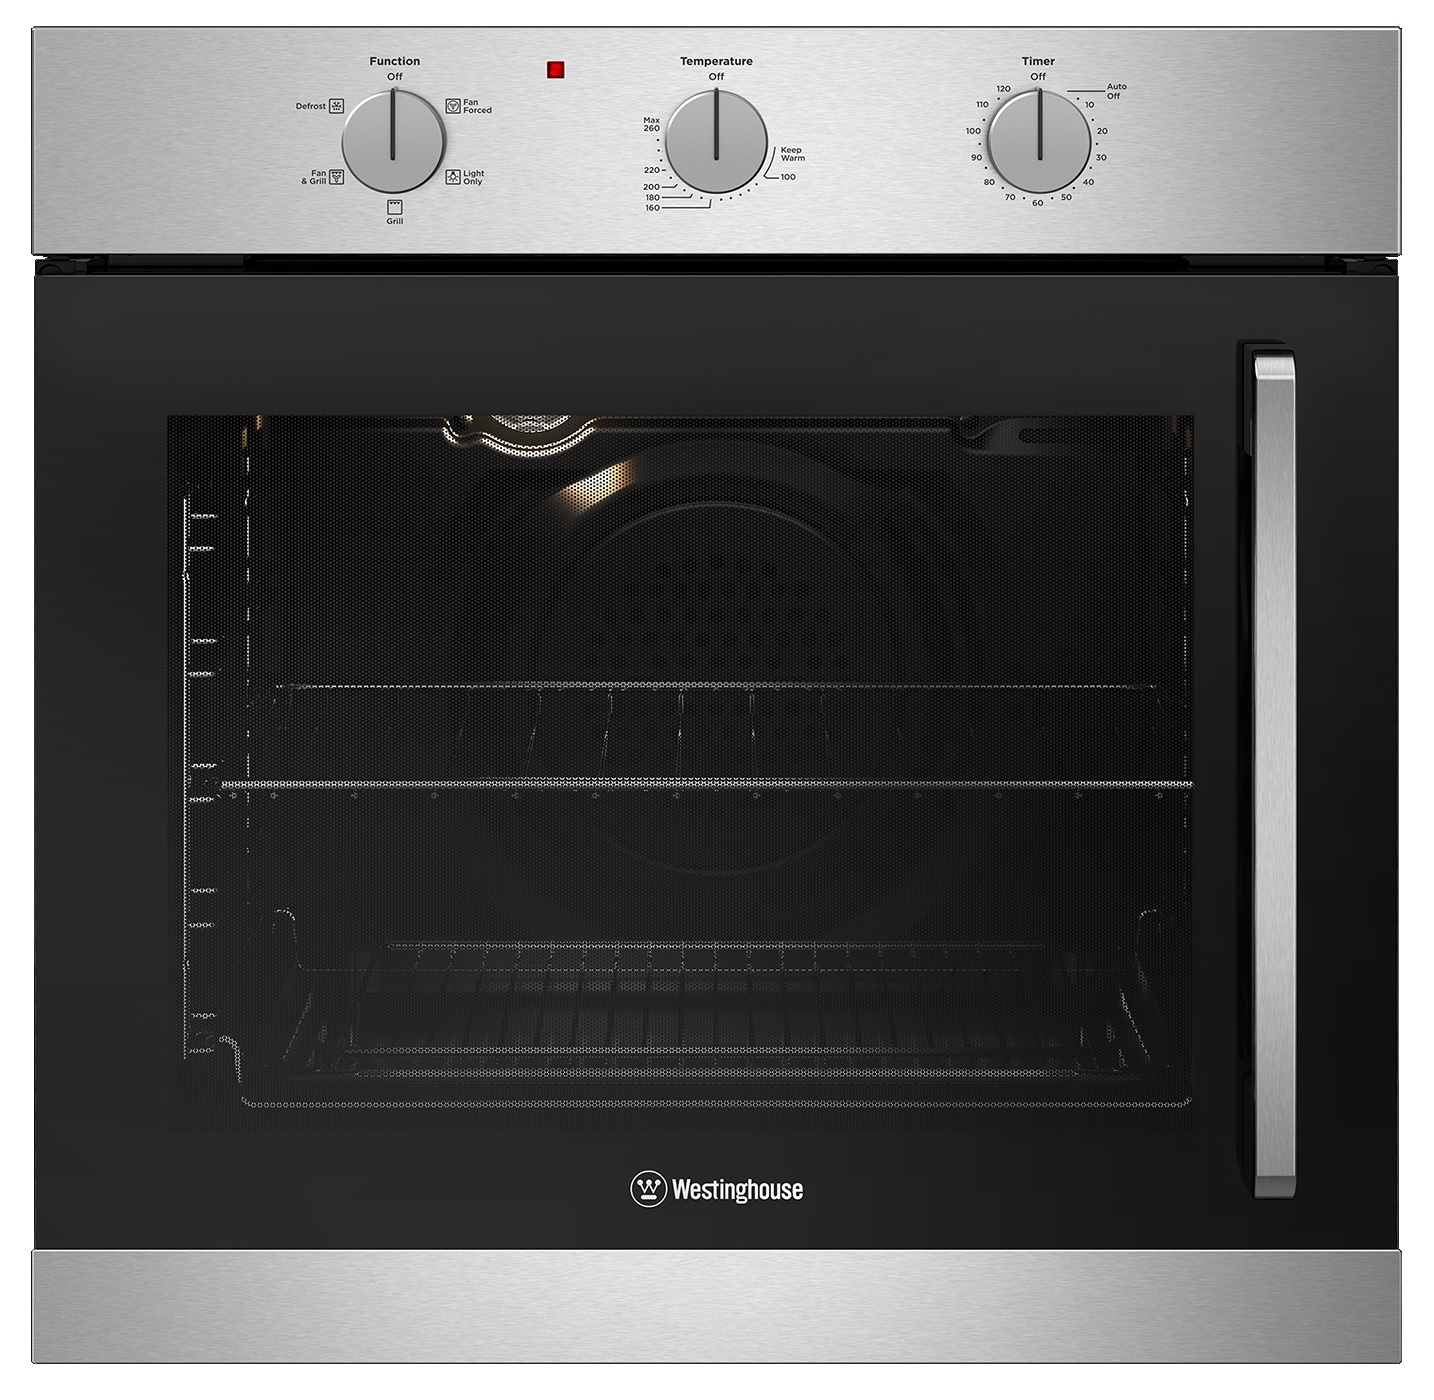 Westinghouse WVES613SC-L Multifunction Oven